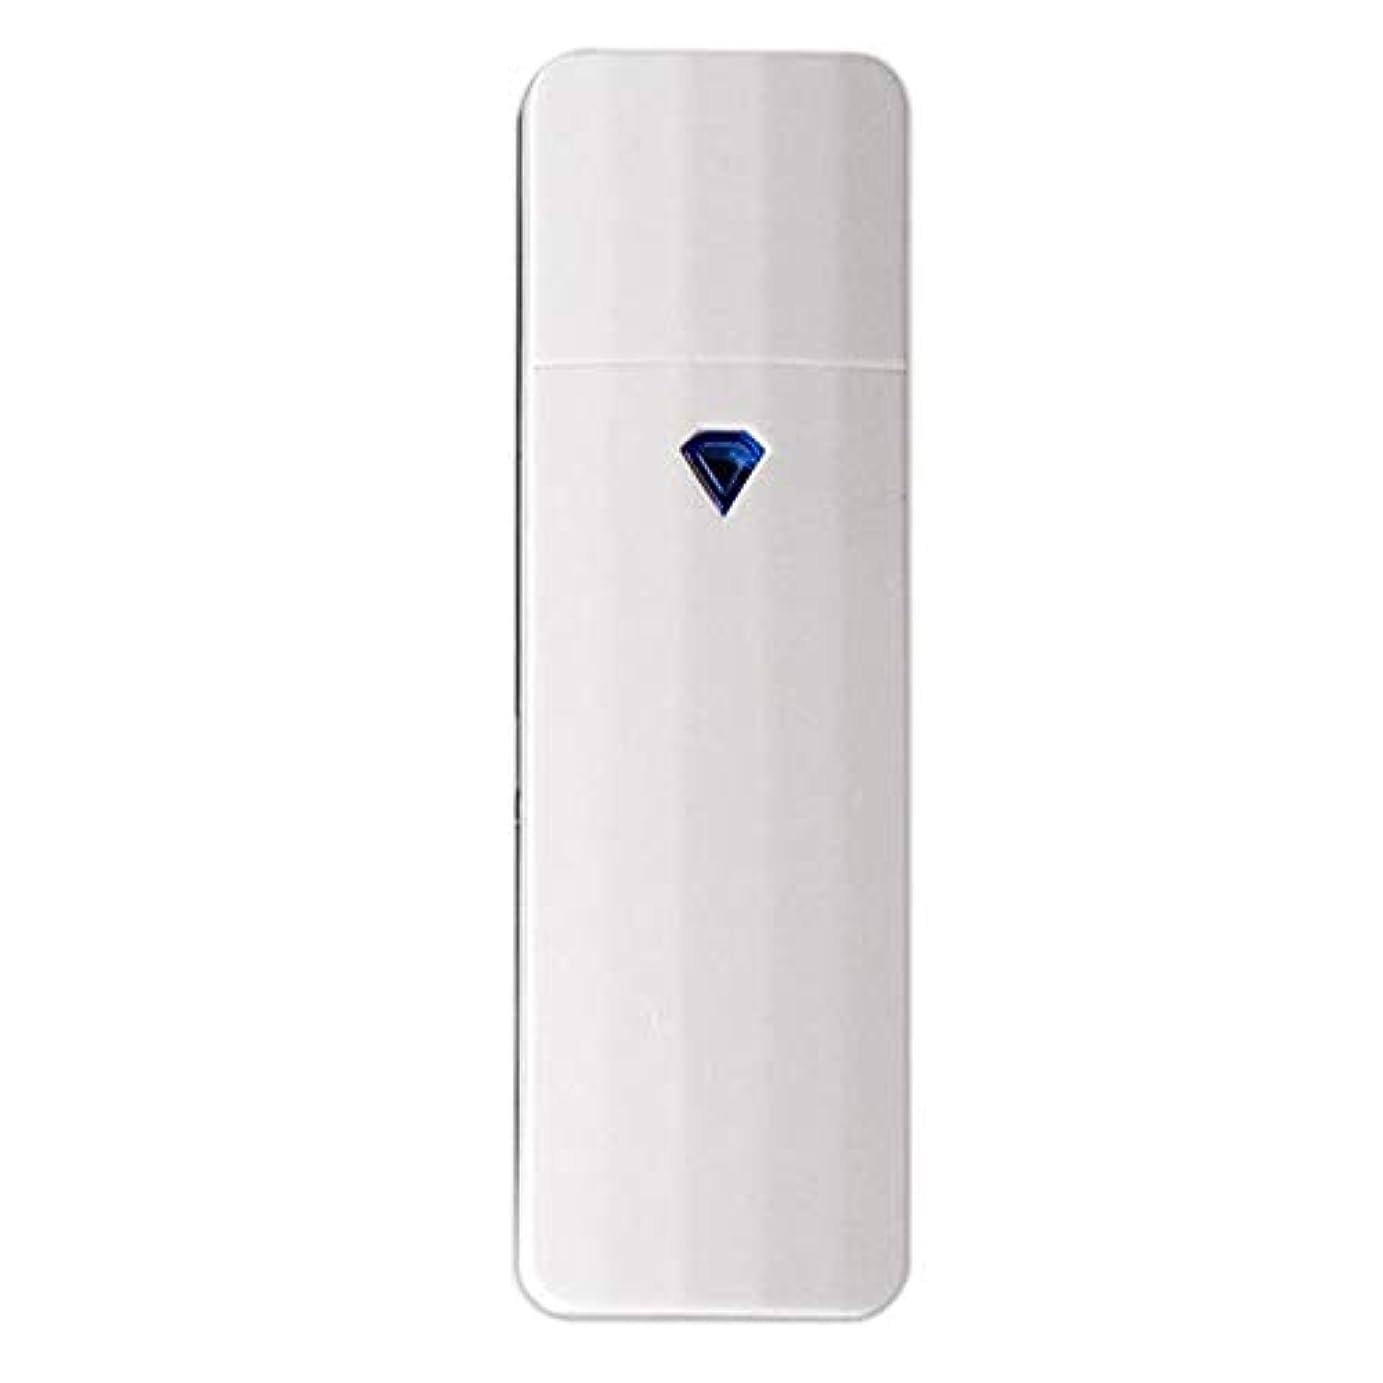 CUHAWUDBA 携帯用ナノ?スプレー、噴霧、便利なフェイシャル?スチーマー、噴霧器、Usb充電式面部保湿水和スプレー装置、美容器具(白色)